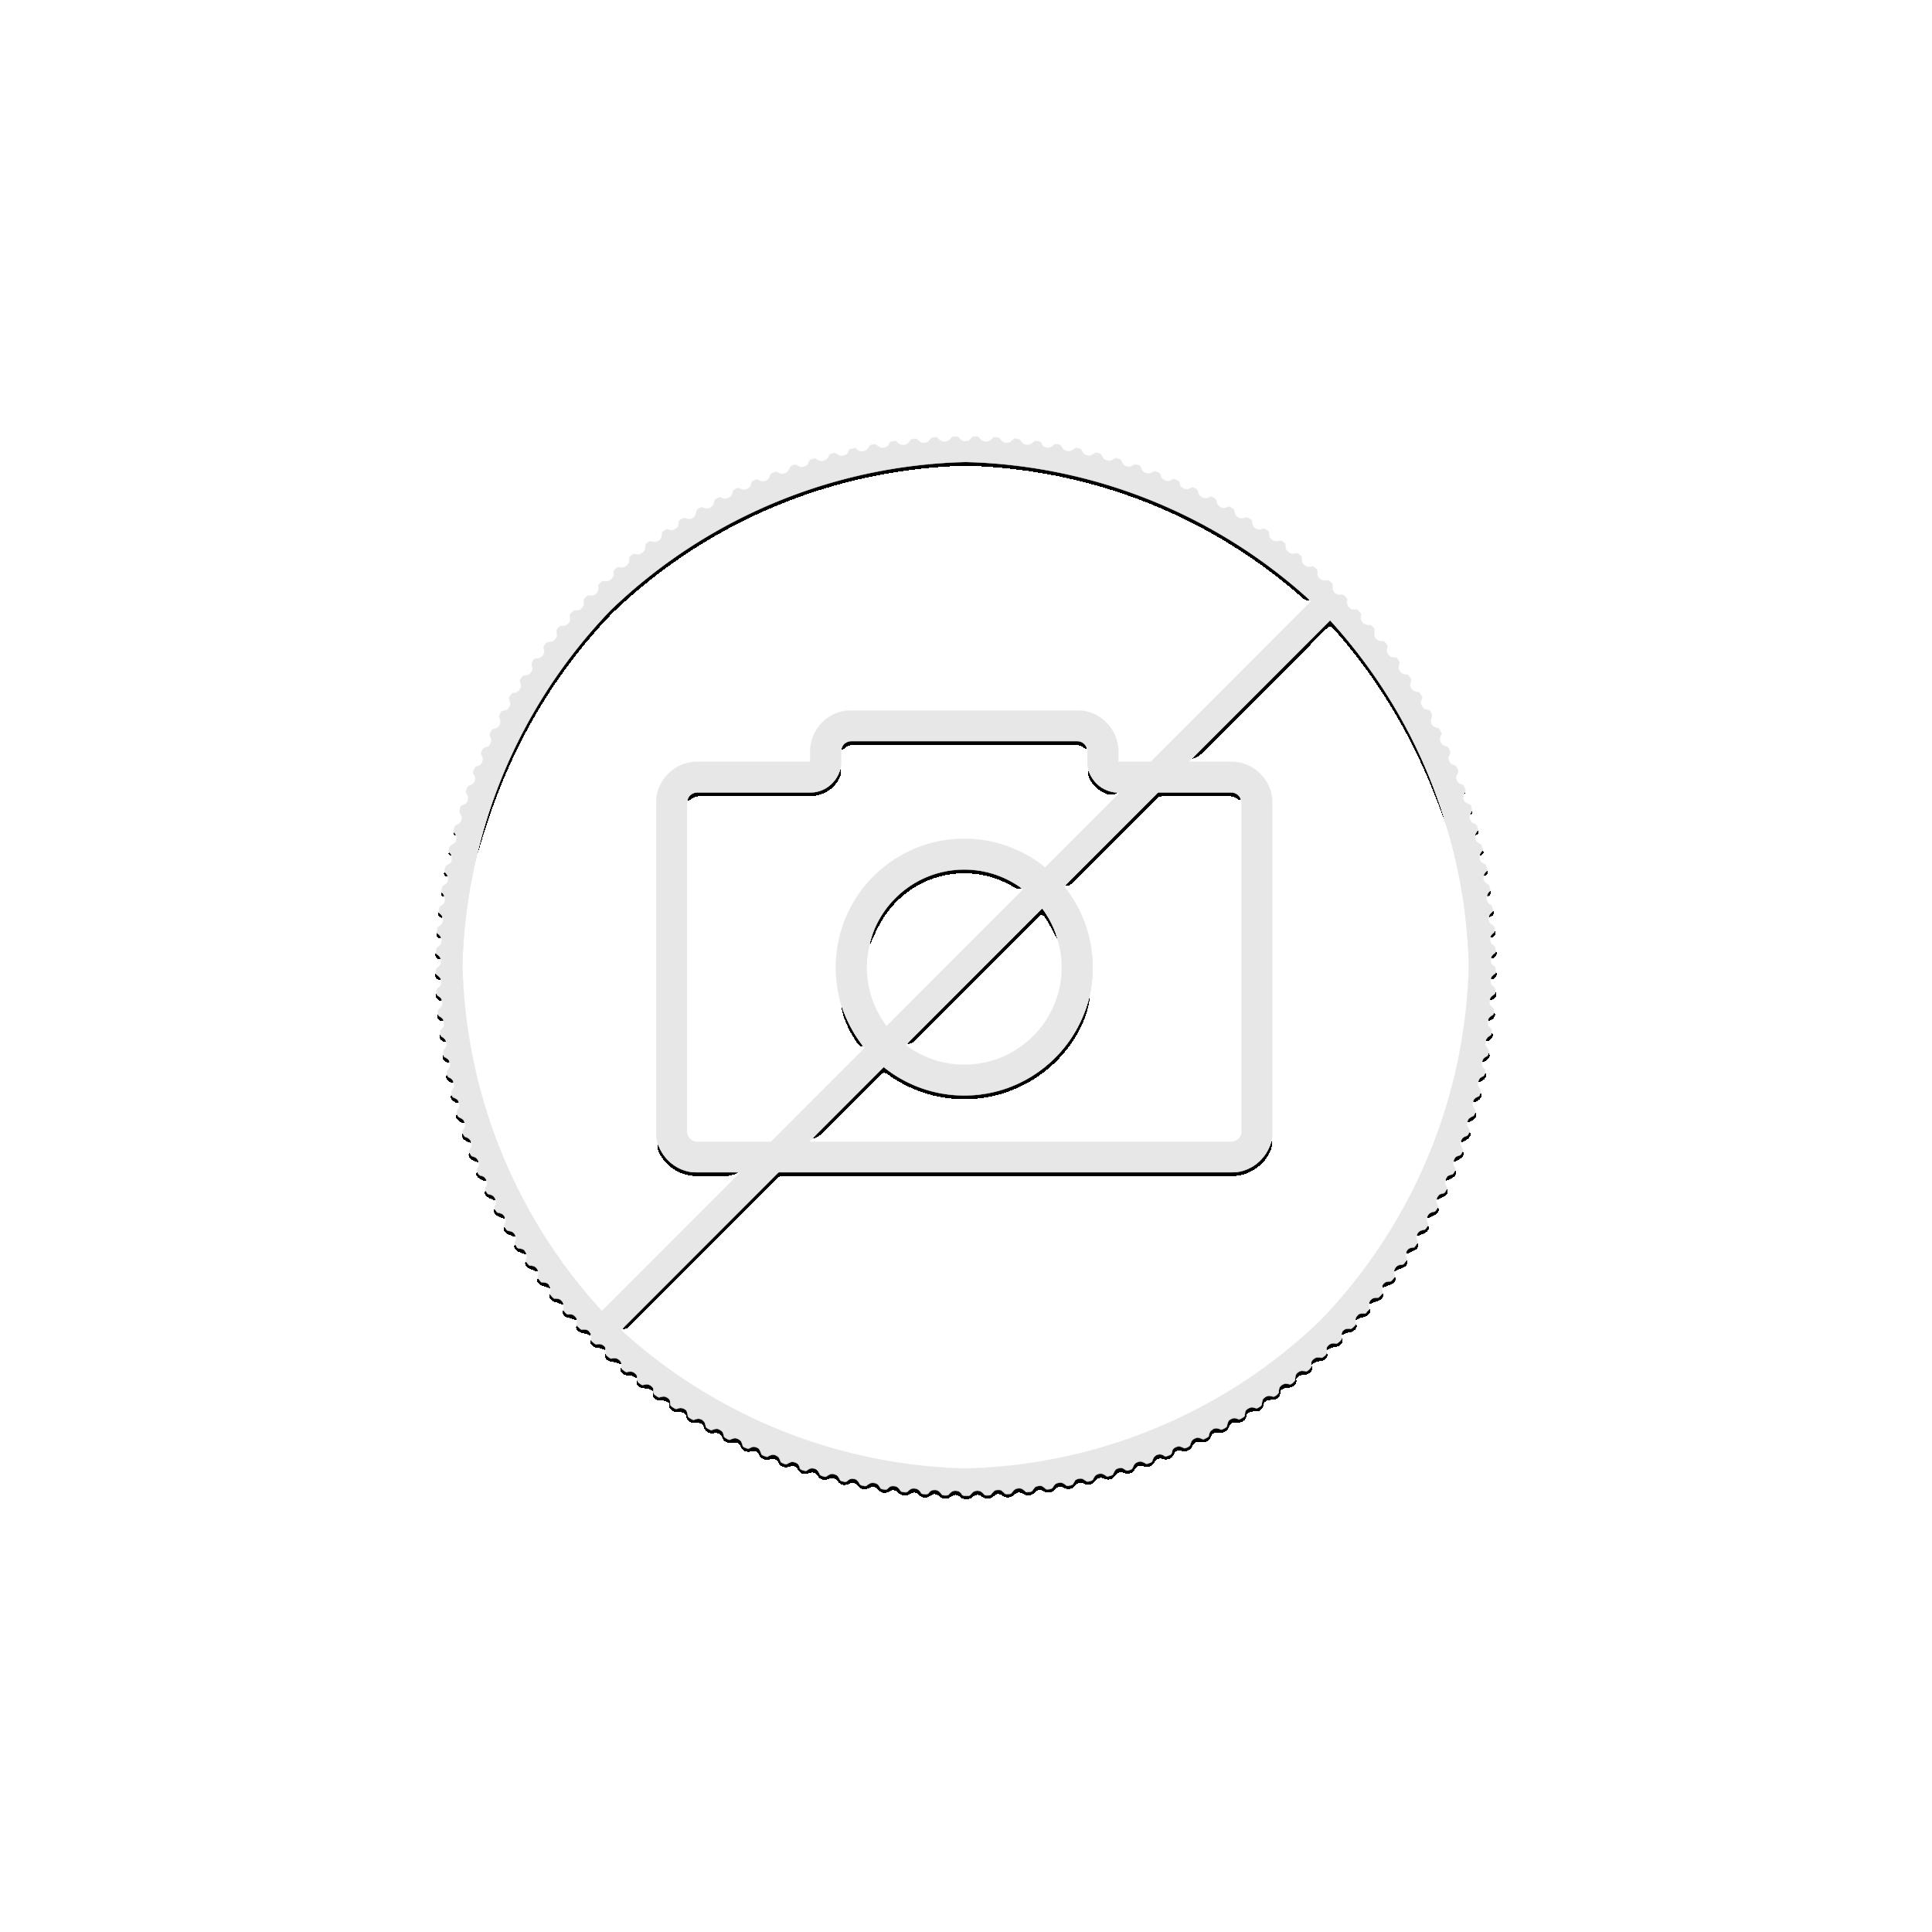 2013 Anniversary Silver Maple Leaf coin